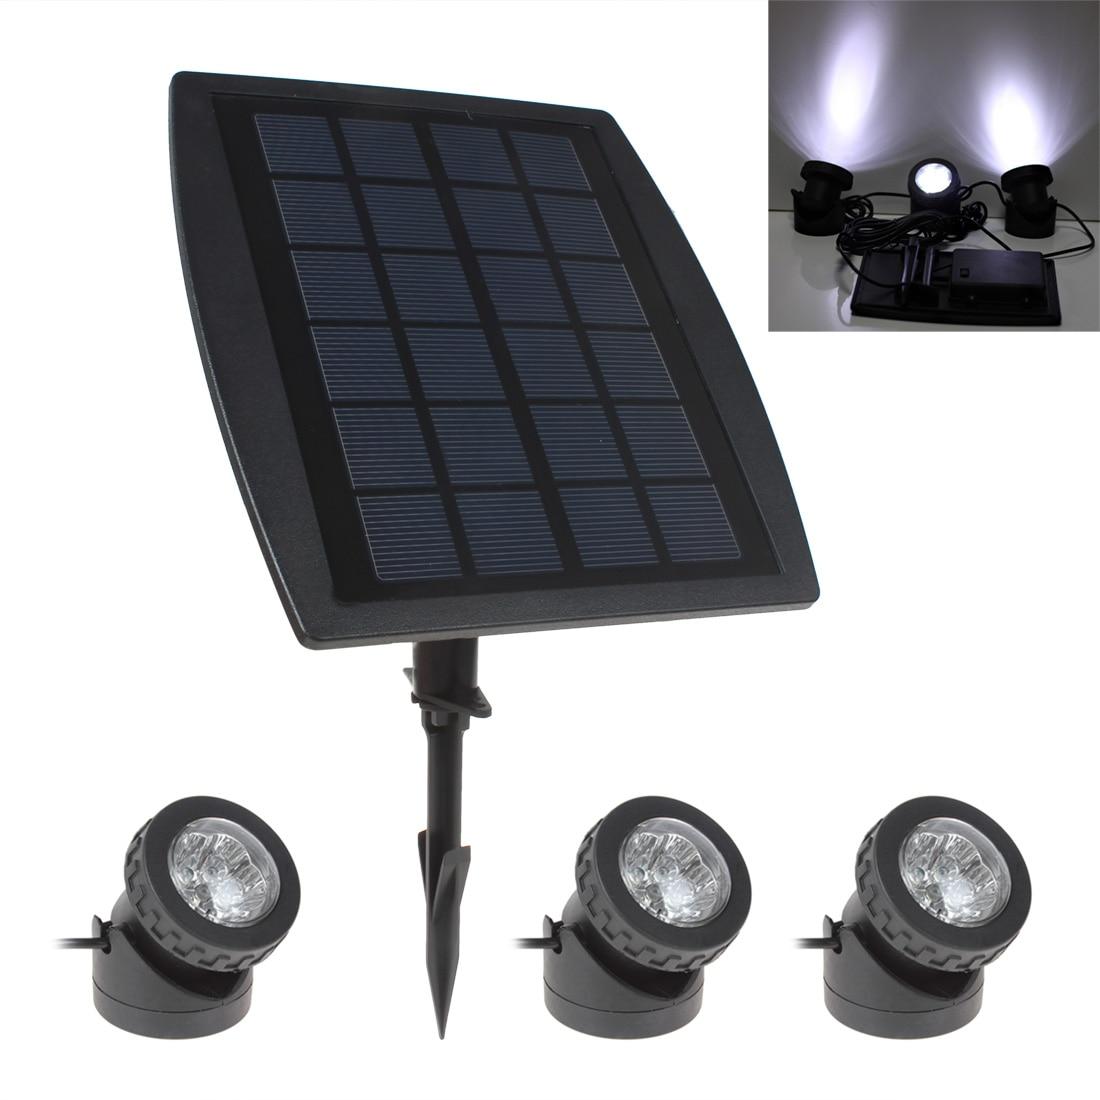 Waterproof LED Solar Light Adjustable BSV SL318 3 x 6 LEDs Light Solar Powered Garden Lamp